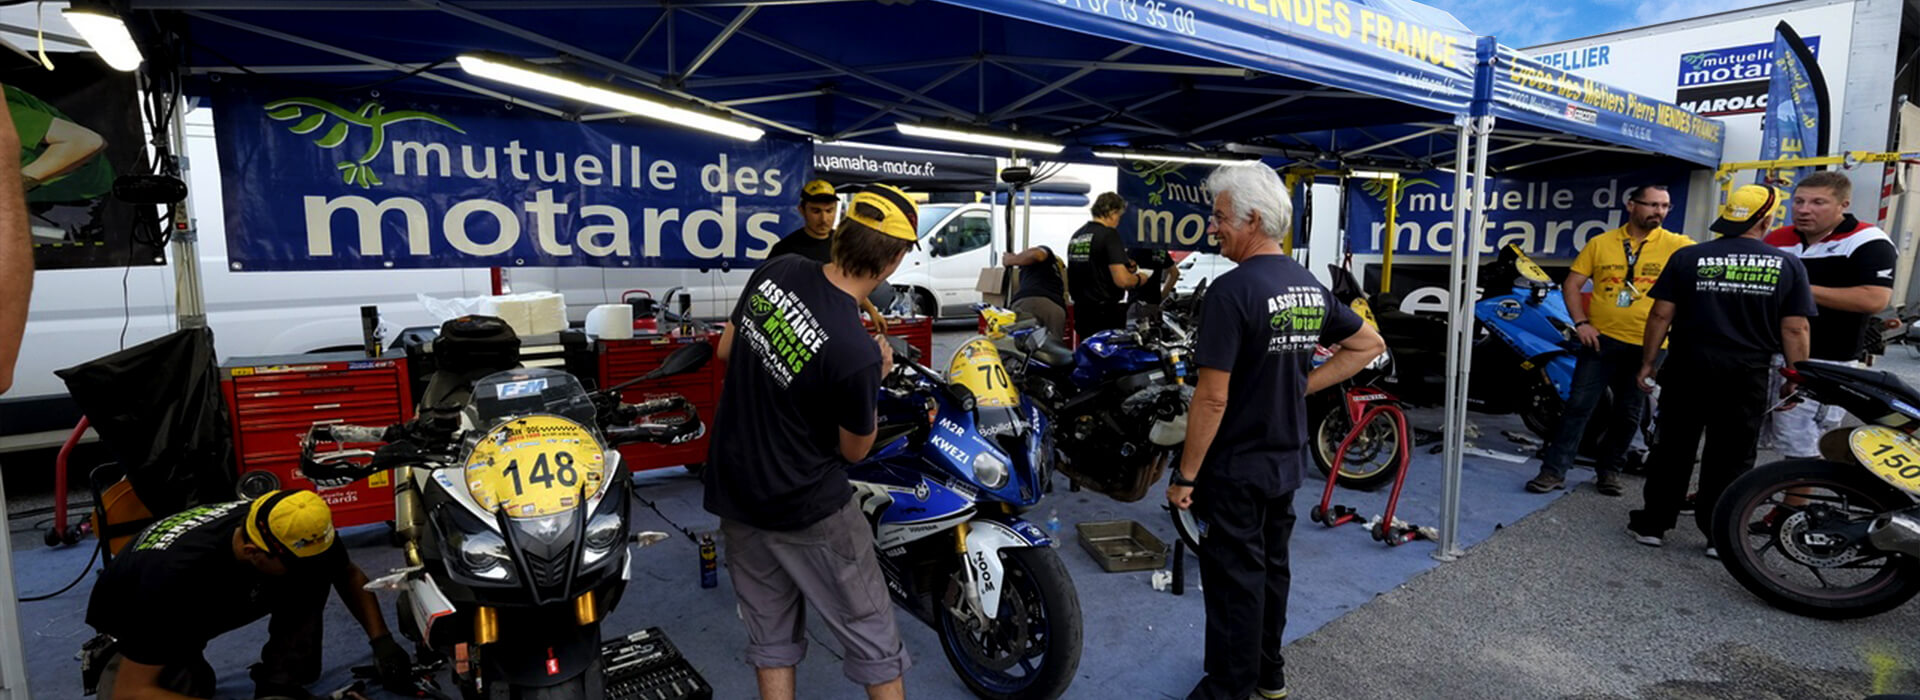 Stand paddock Moto